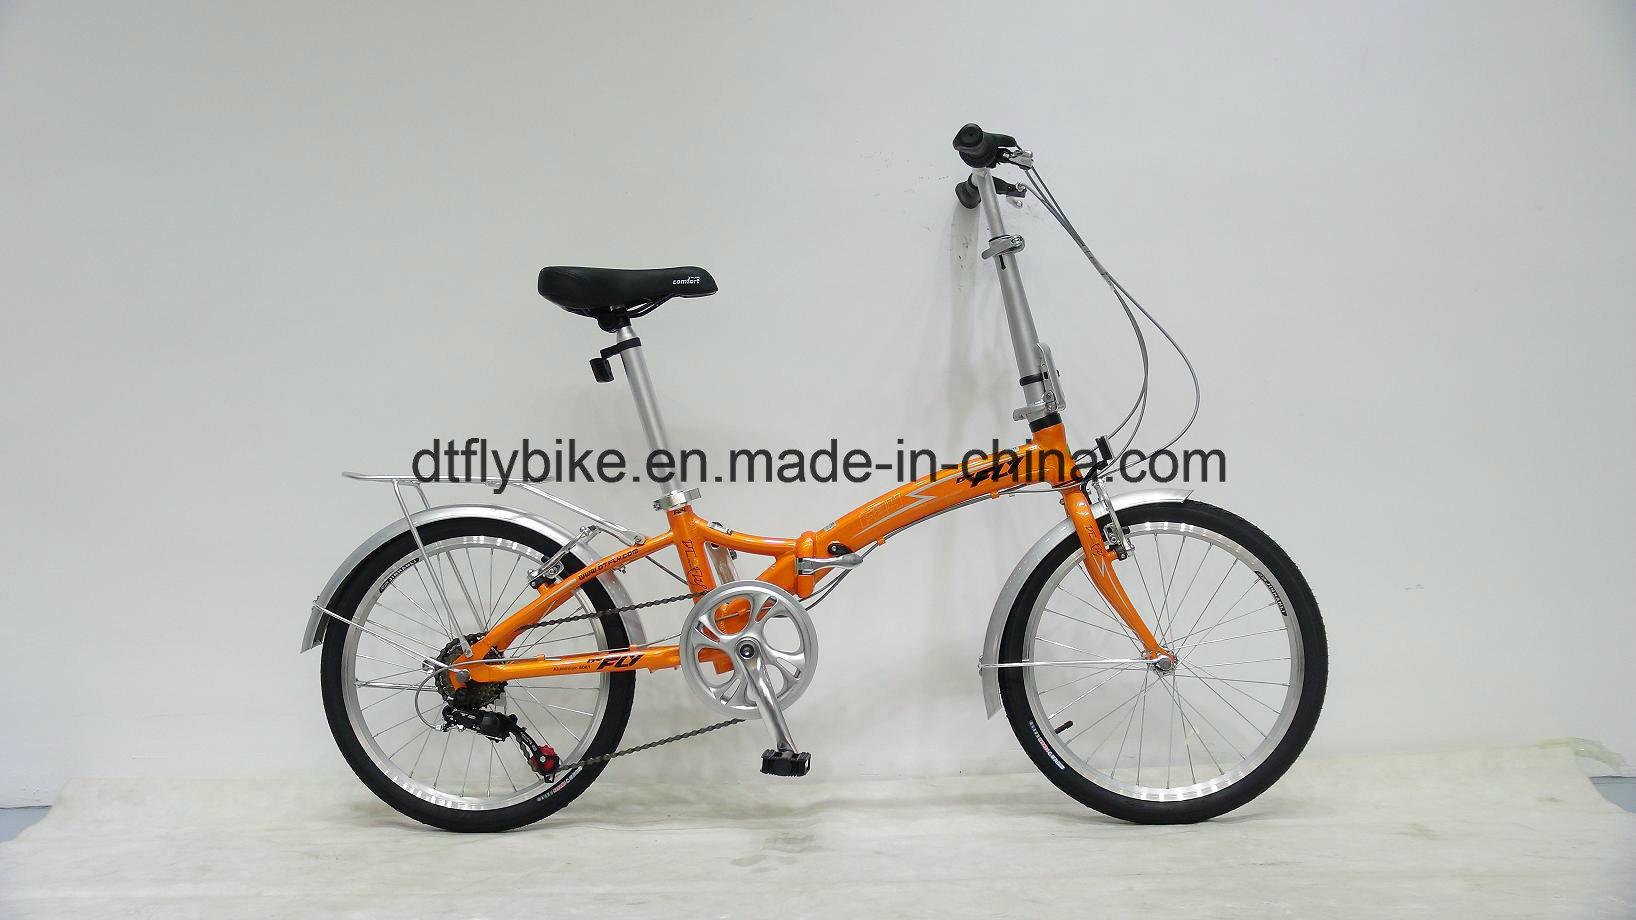 20inch Alloy Frame Folding Bike, Foldable Bicycle